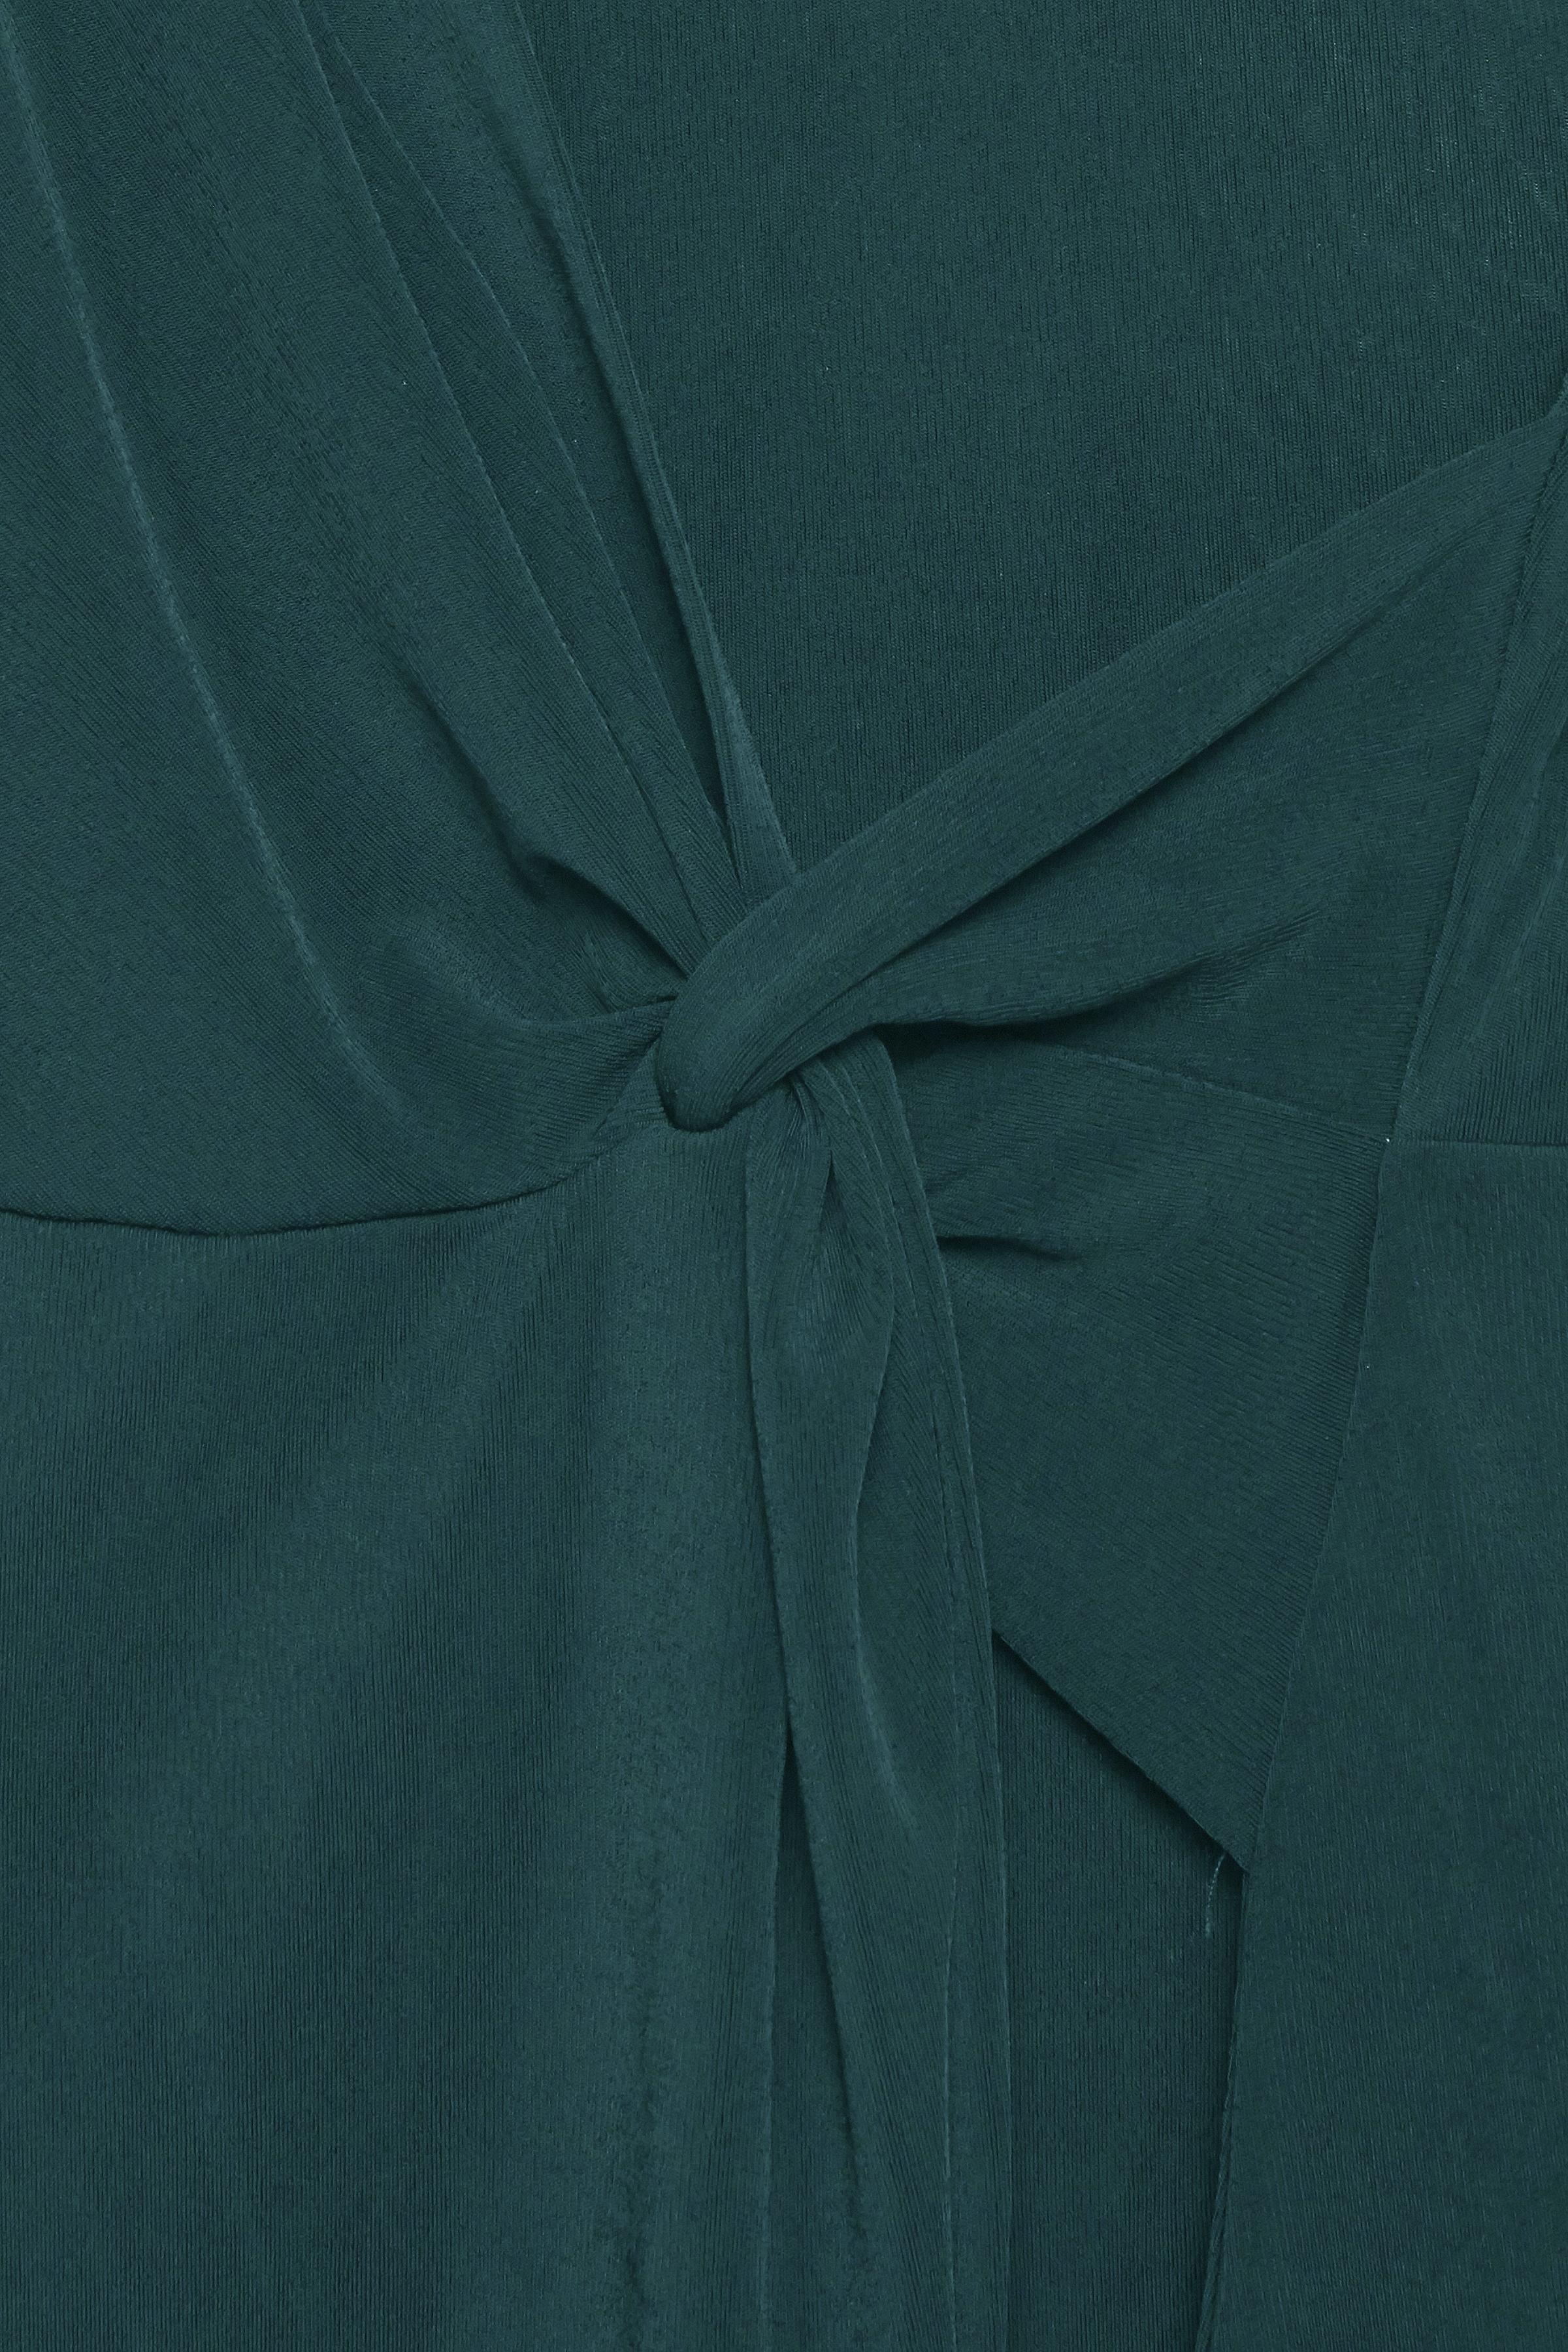 Majestic Green Langarm-Shirt von b.young – Kaufen Sie Majestic Green Langarm-Shirt aus Größe XS-XL hier